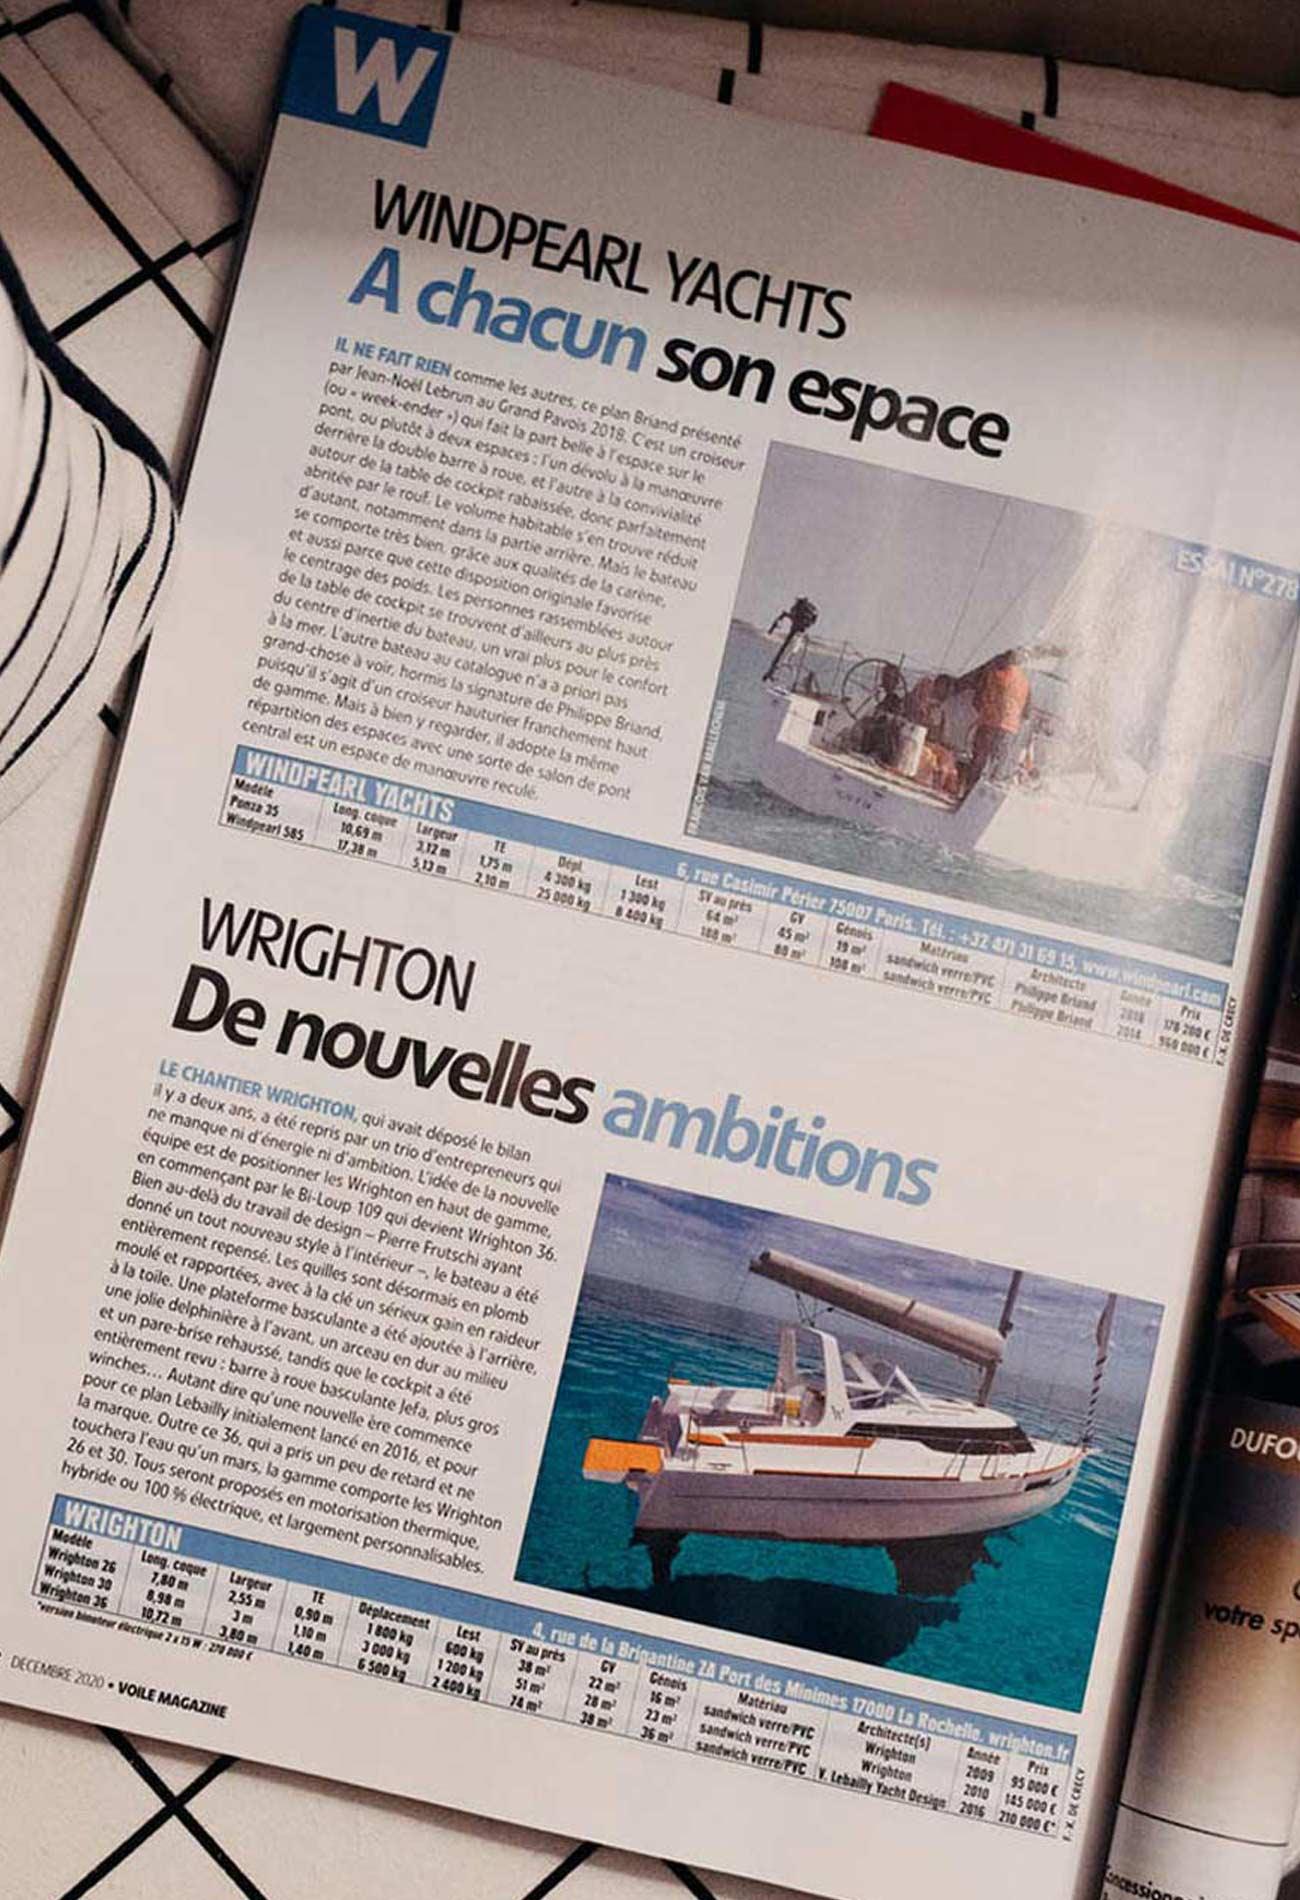 Wrighton-voilier-Vincent-Lebailly-Architecture-navale-voilier-de-serie-biquille